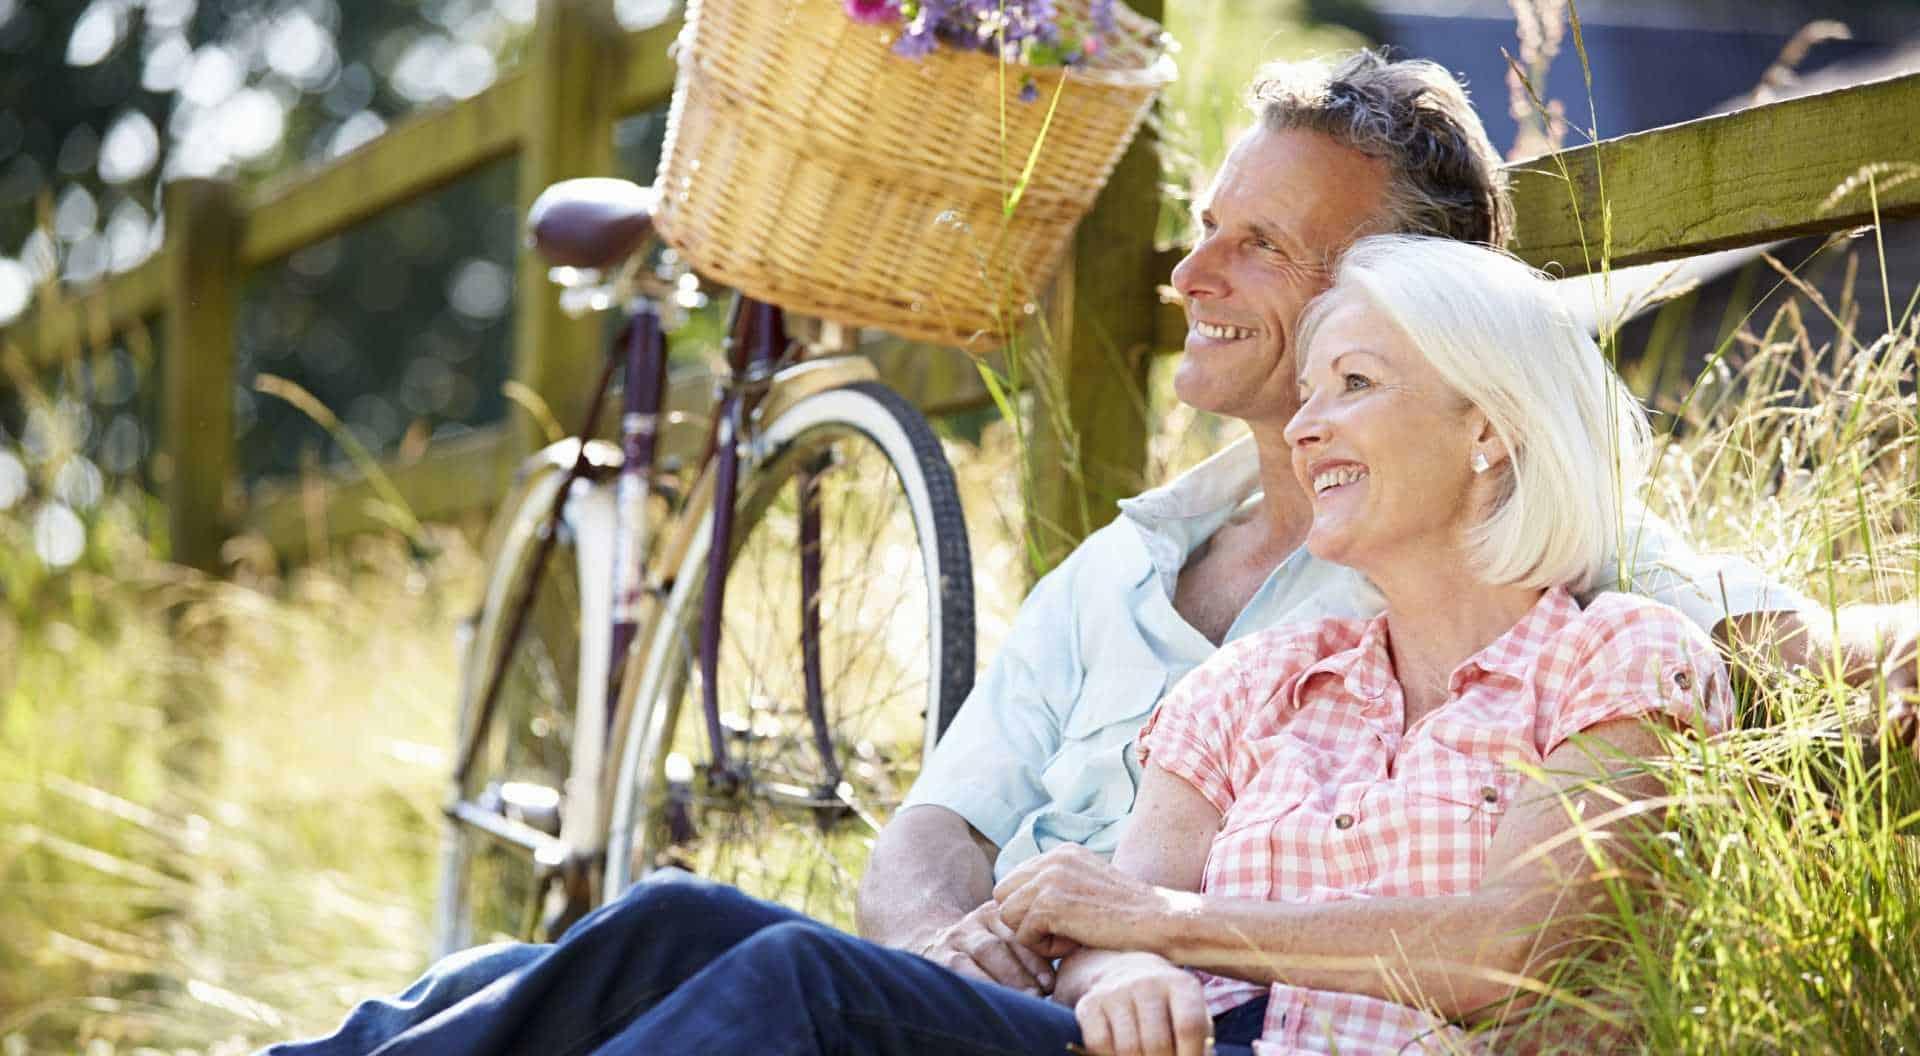 s1-relationship-coach-fair-oaks-ca-marriage-counseling-fair-oaks-ca-c